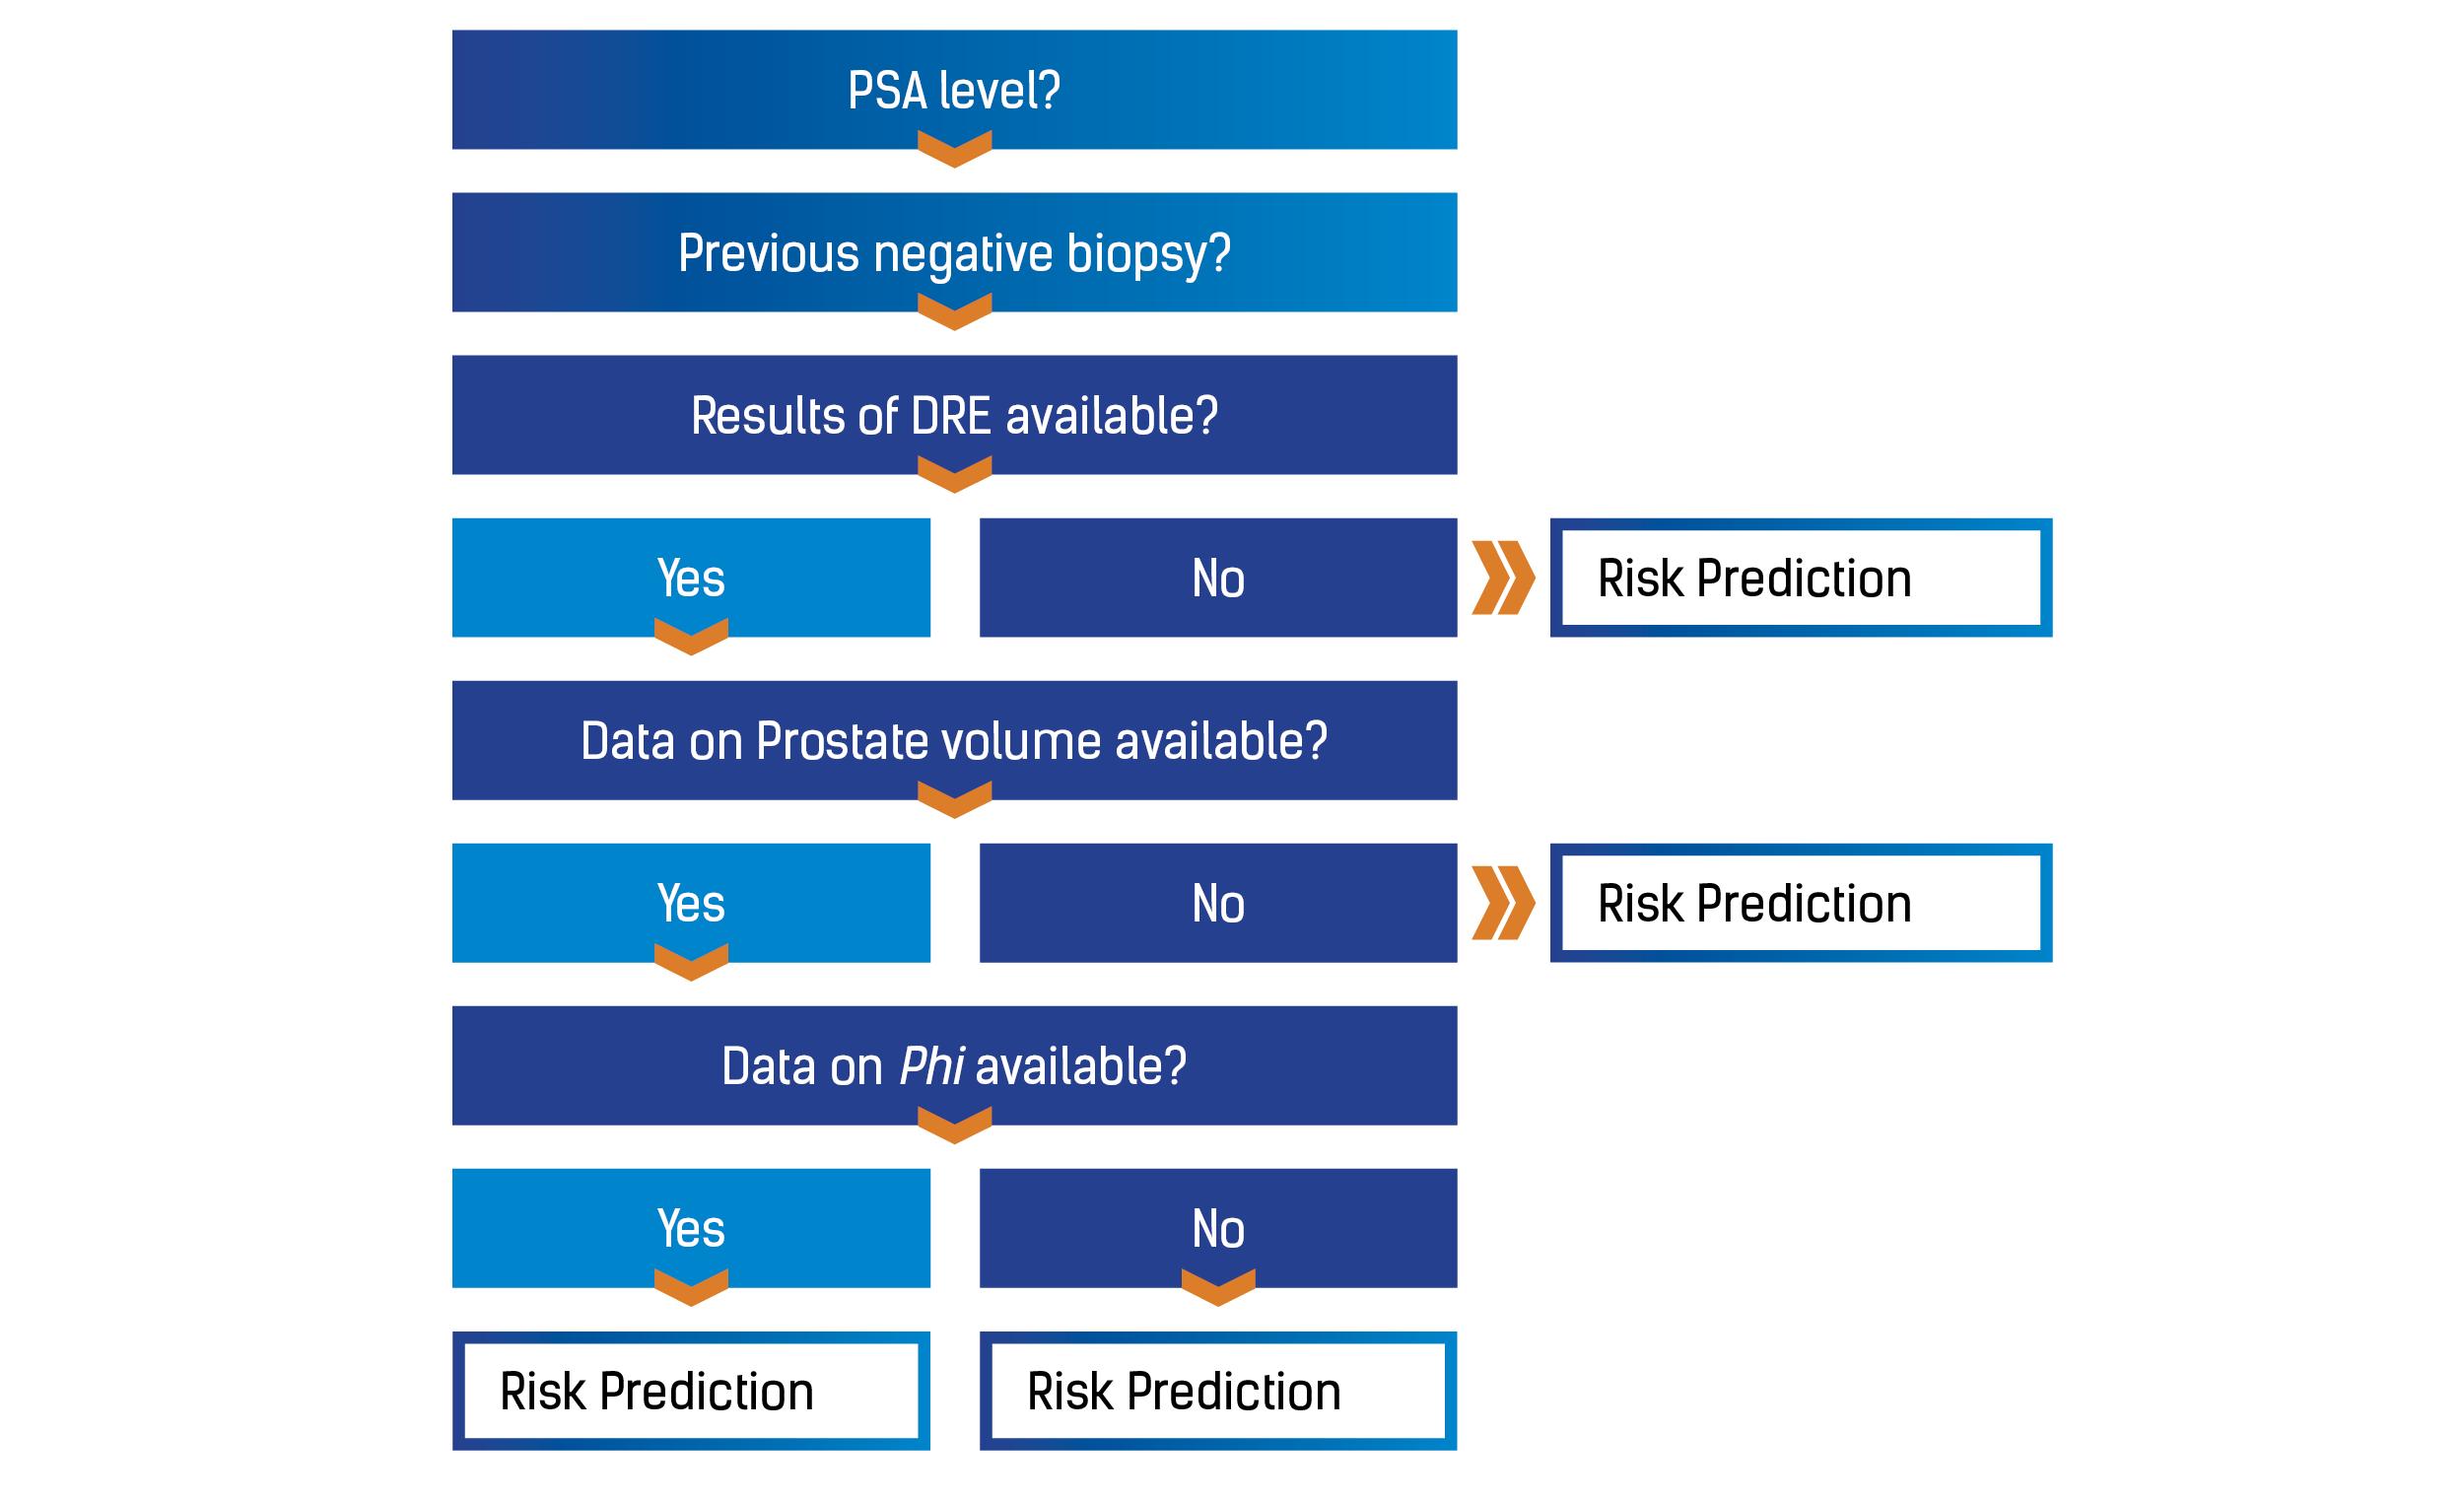 the rotterdam prostate cancer risk calculator decision tree psa prostate specific antigen dre digital rectal examination phi prostate health index